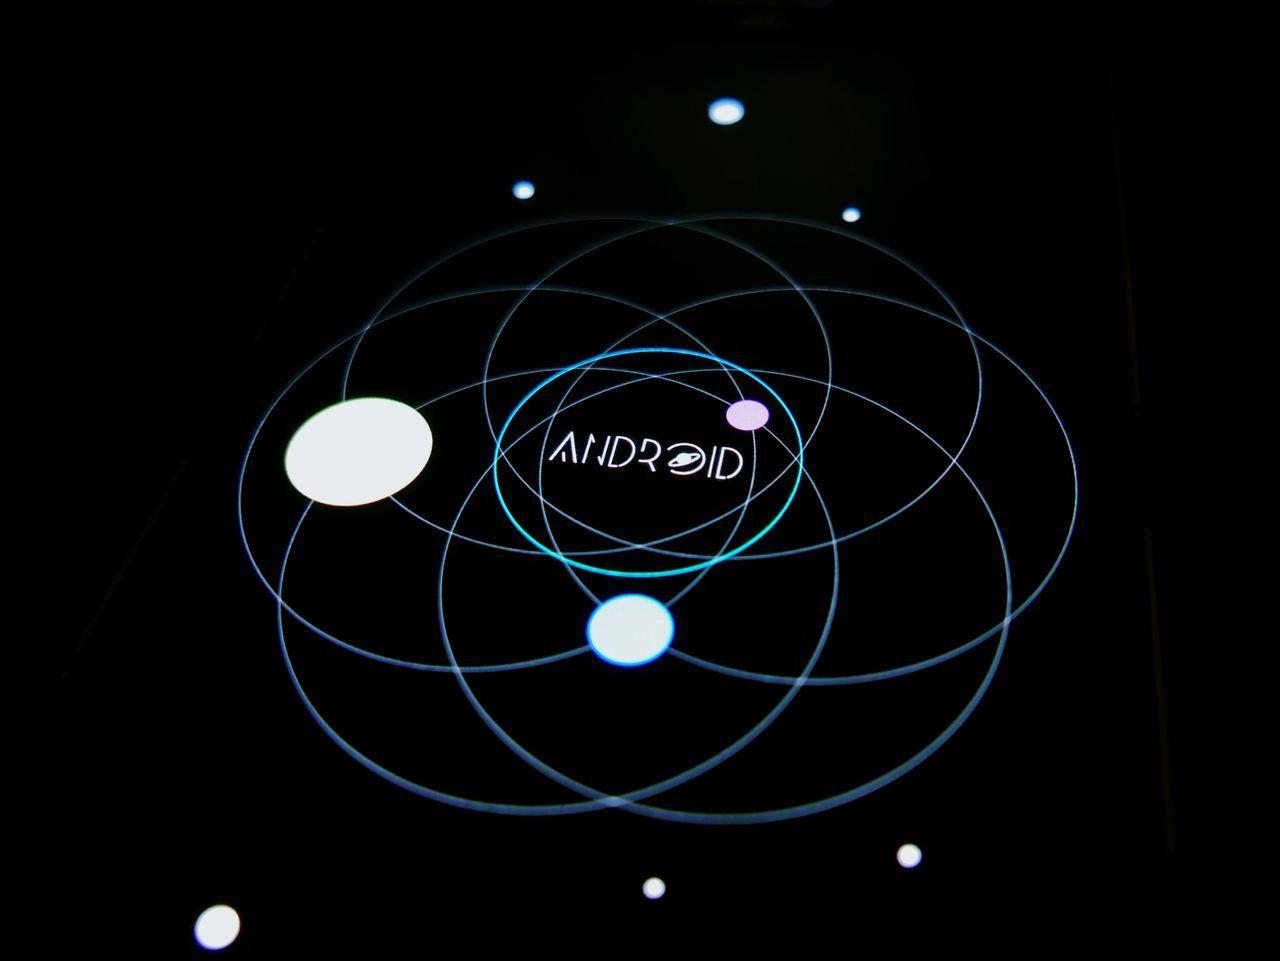 circle, communication, no people, technology, illuminated, close-up, indoors, night, black background, planet earth, astronomy